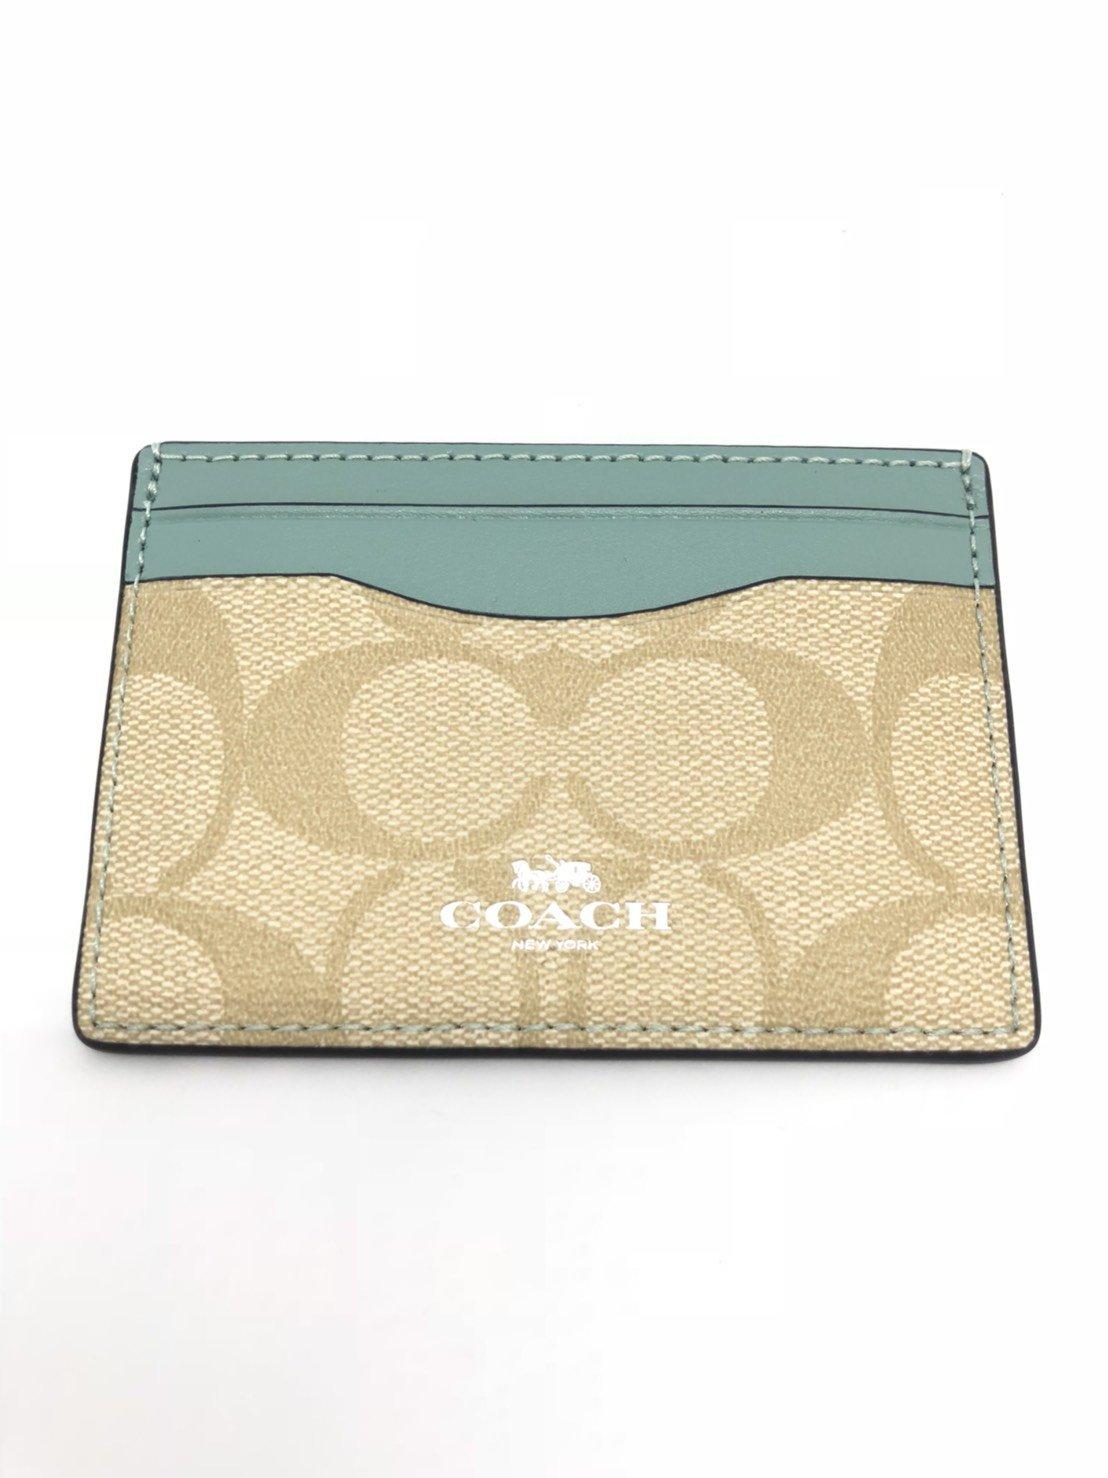 Coach Signature PVC Card Case (SV/Light Khaki/Aquamarine)